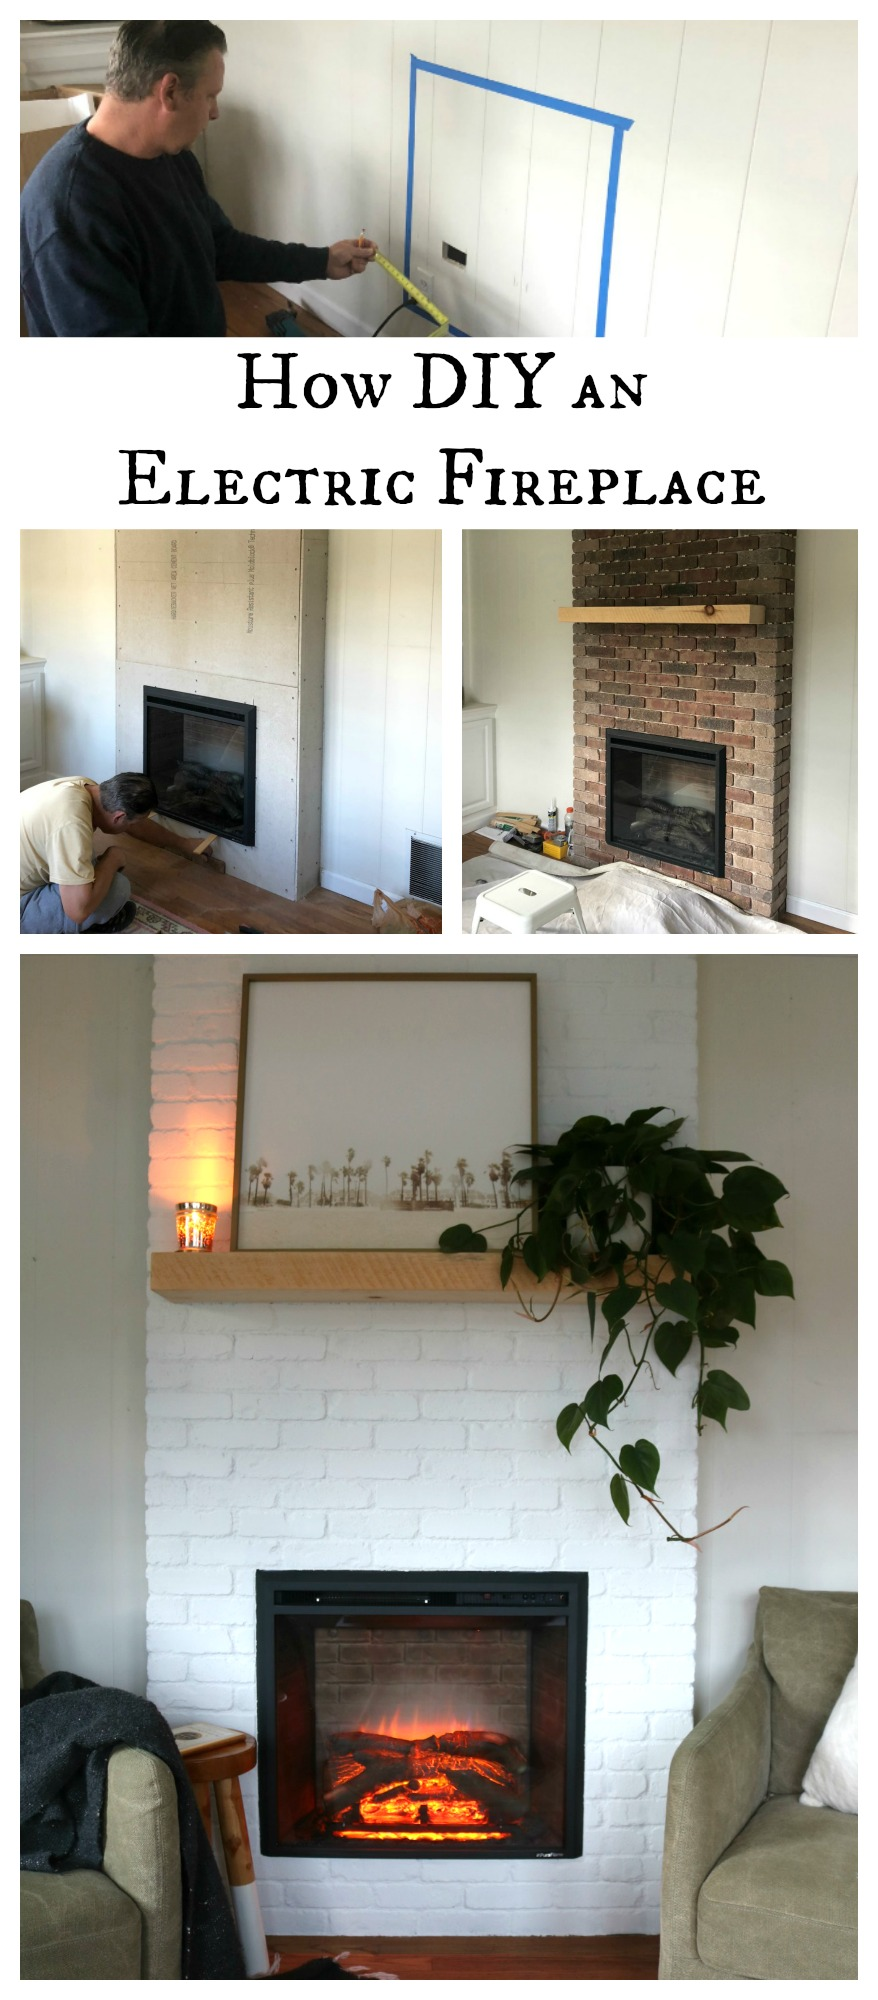 How to DIY an Electric Fireplace- Top Blog Posts